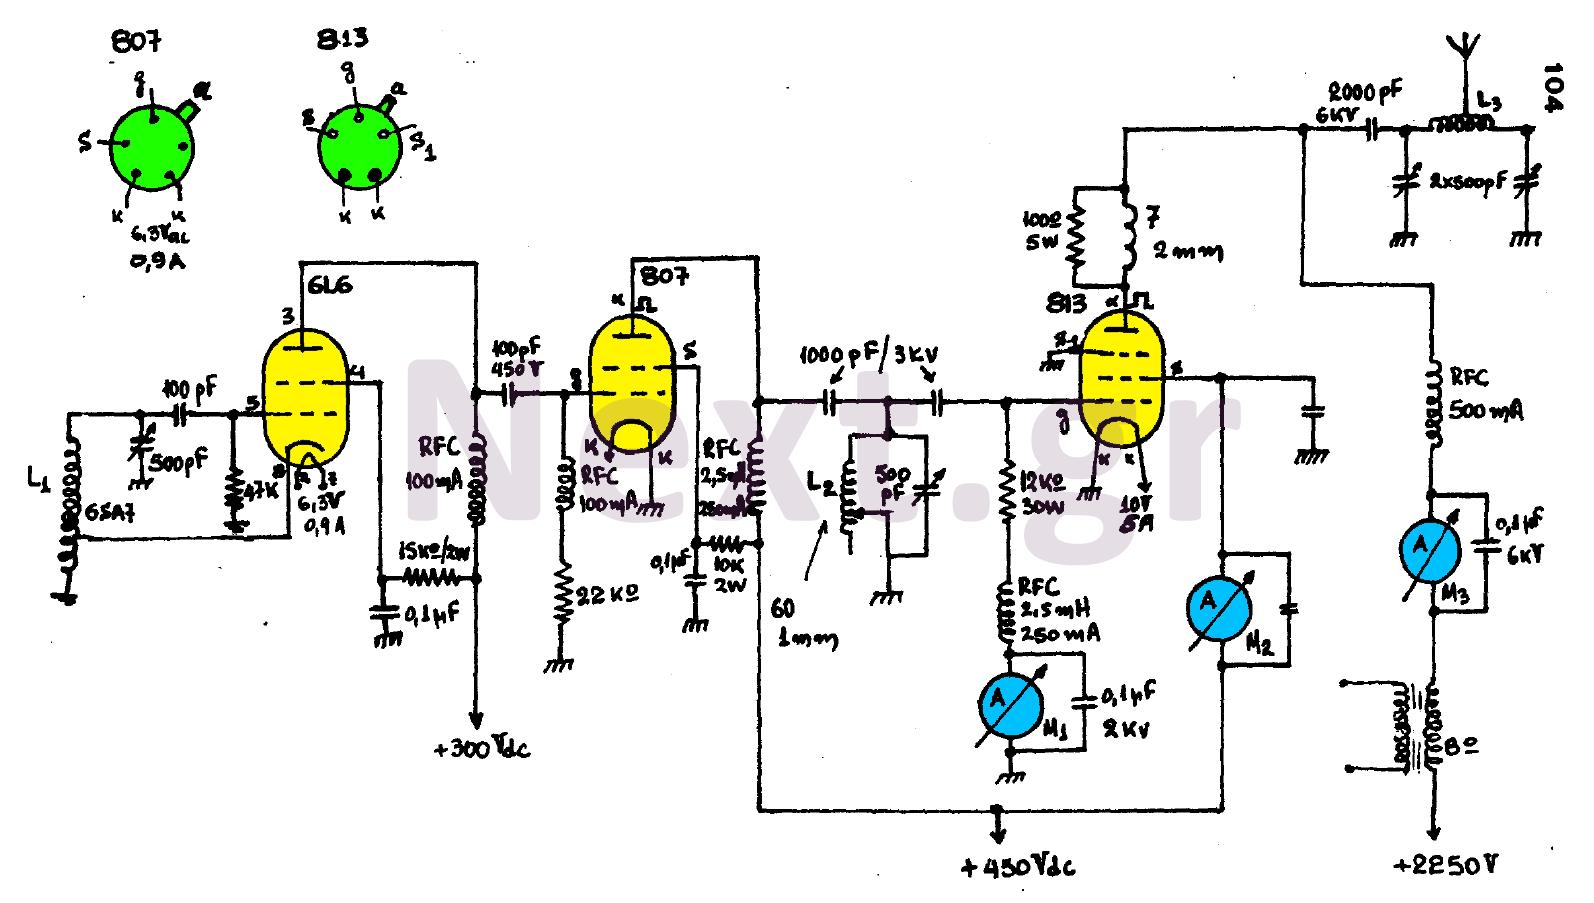 300W Valve RF Transmitter circuit - schematic